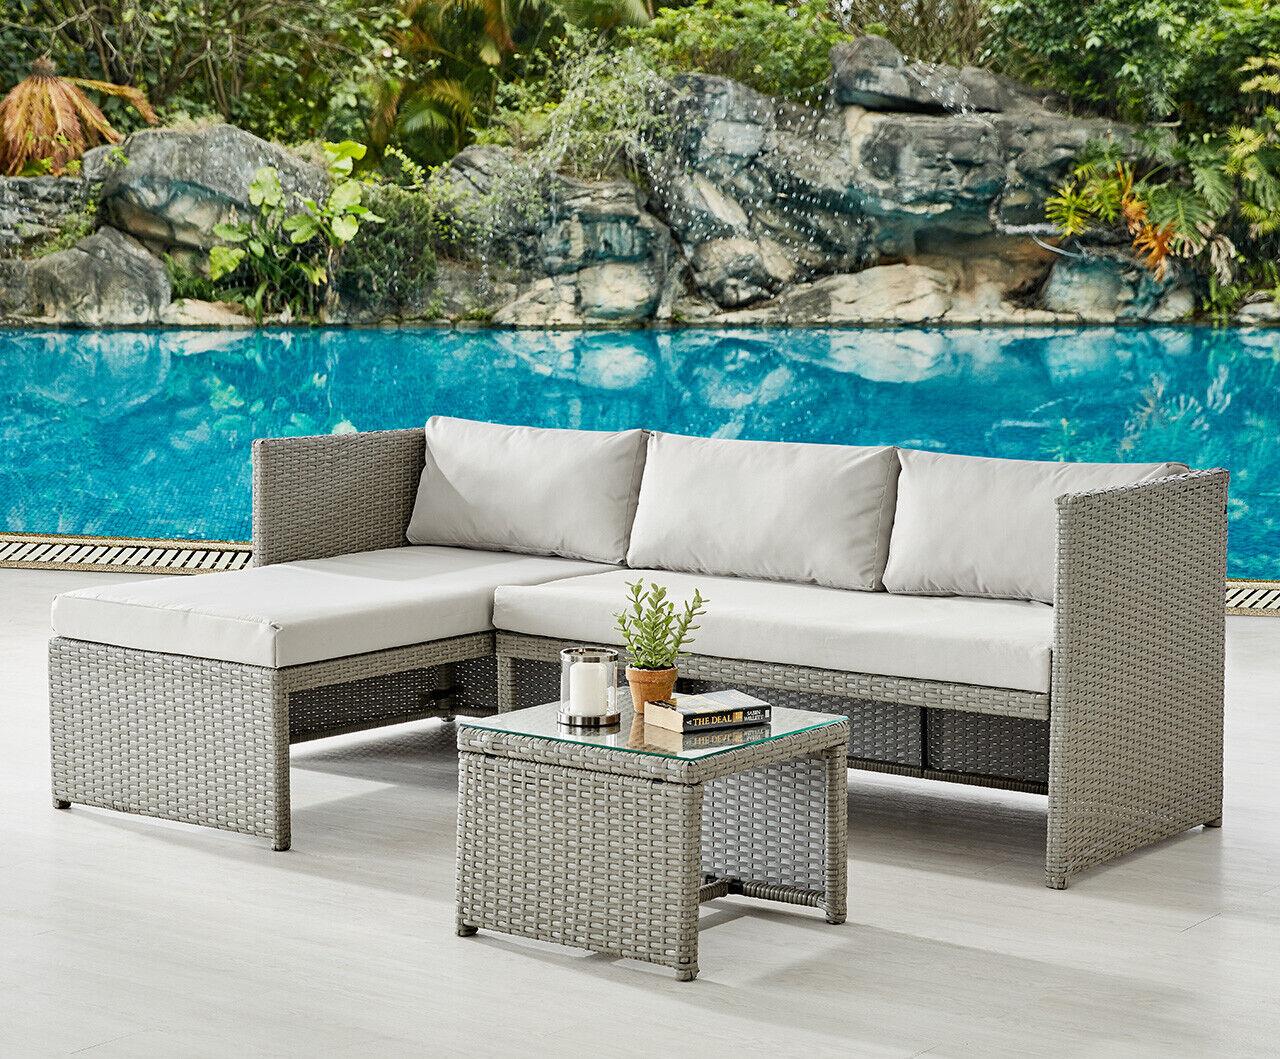 Garden Furniture - Rattan Garden Furniture Sofa Set Grey or Black Patio Outdoor Corner Lounge Set